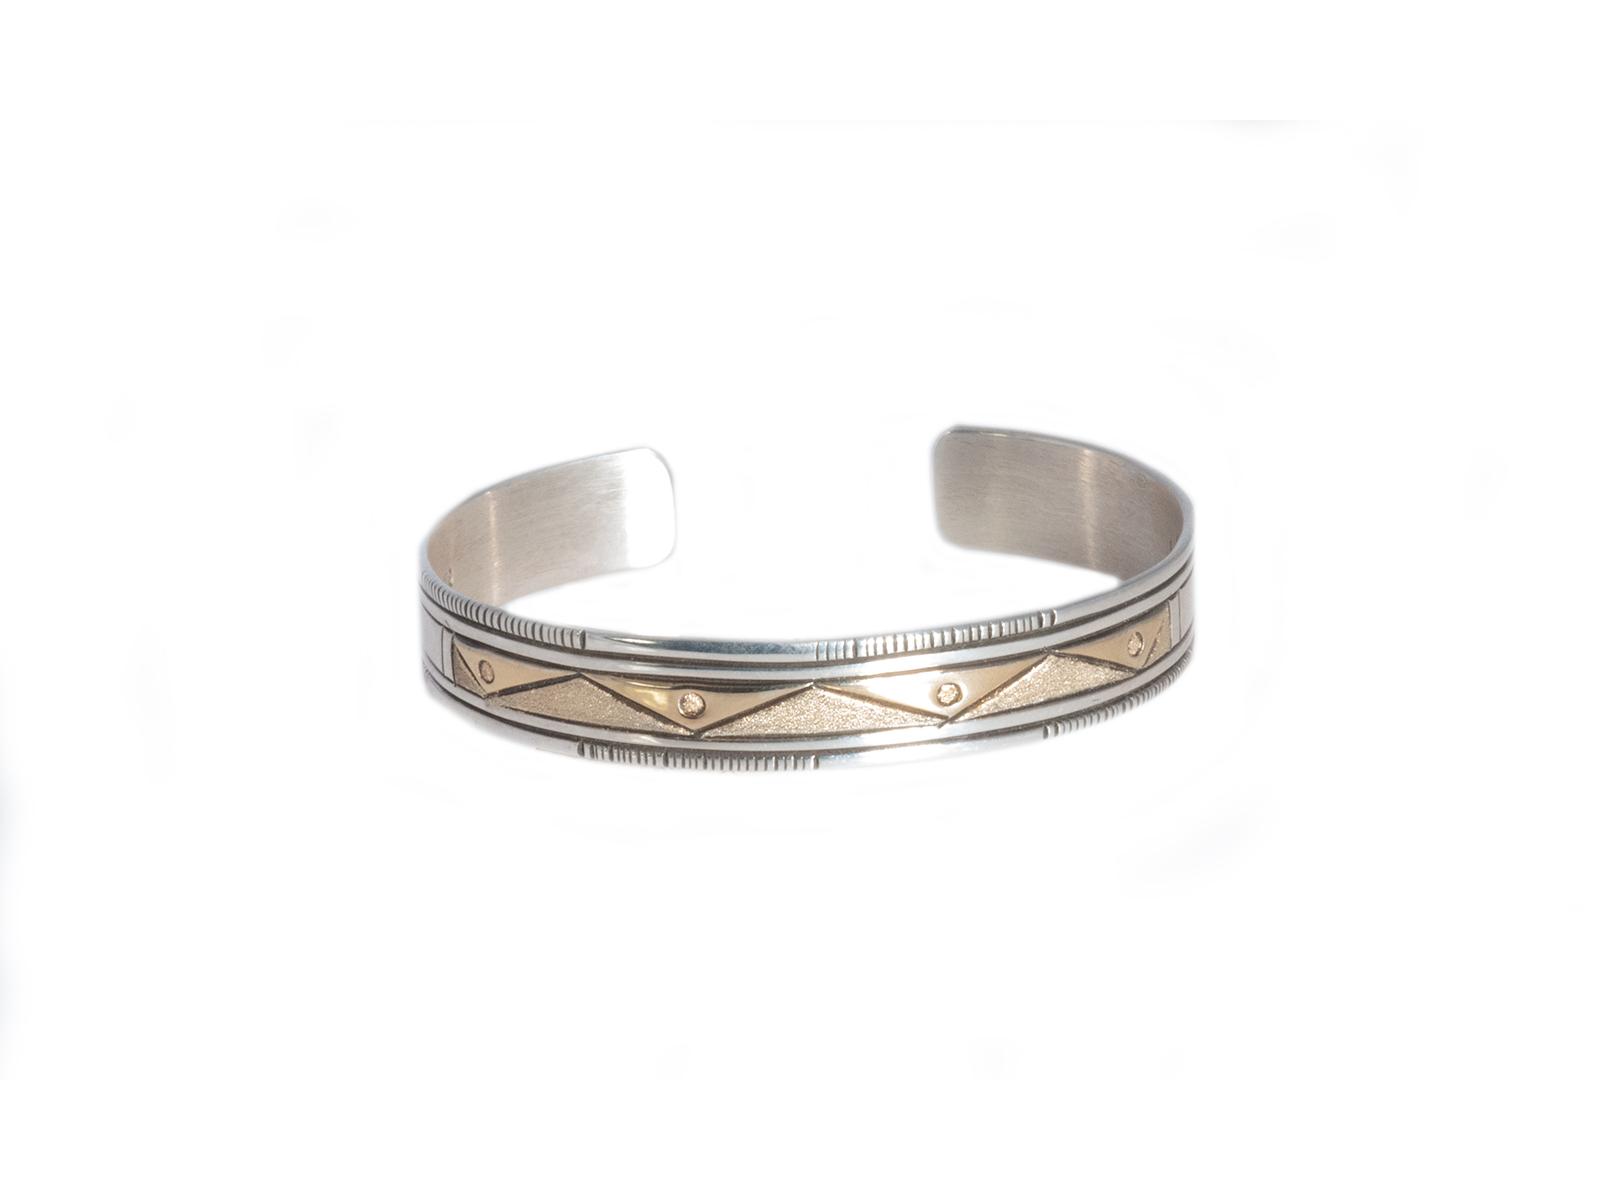 Navajo Silver Gold Cuff Bracelet